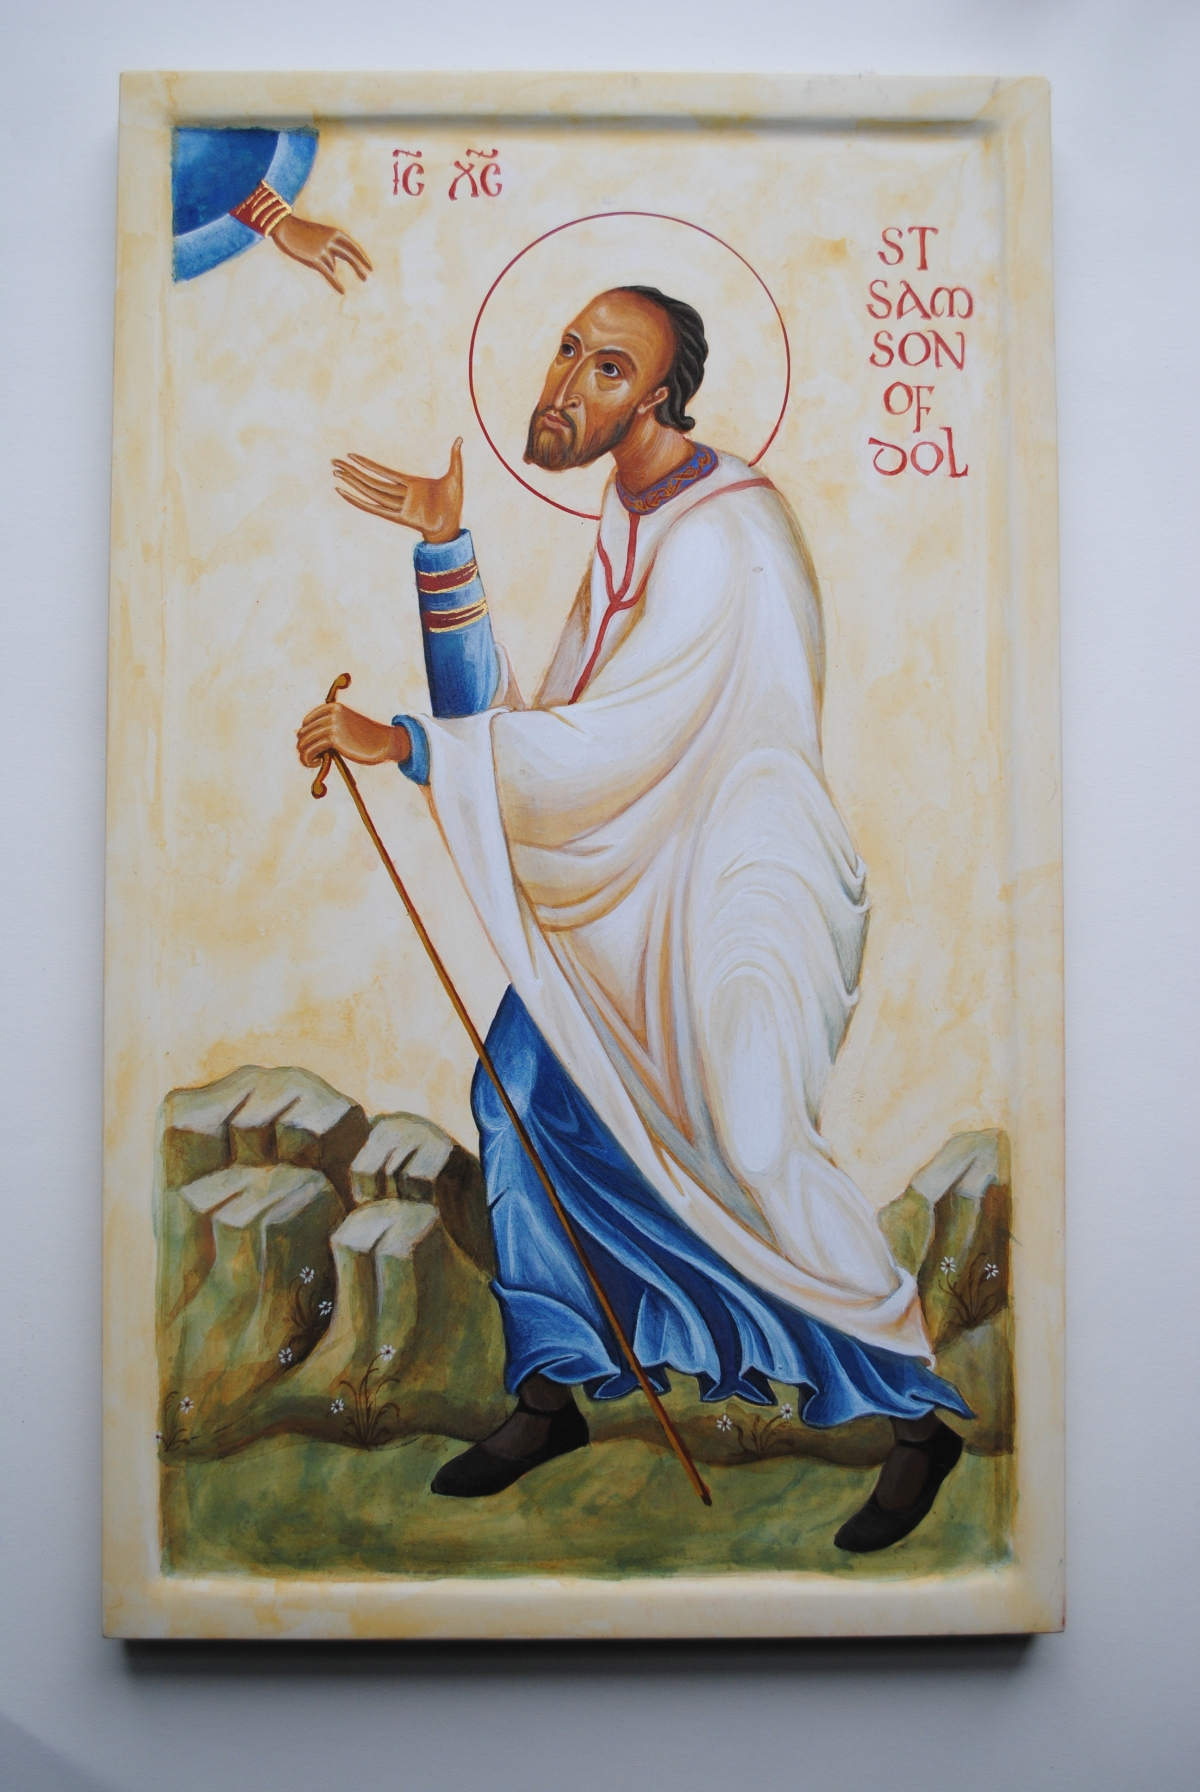 saint samson of dol Orthodox saint of Brittany